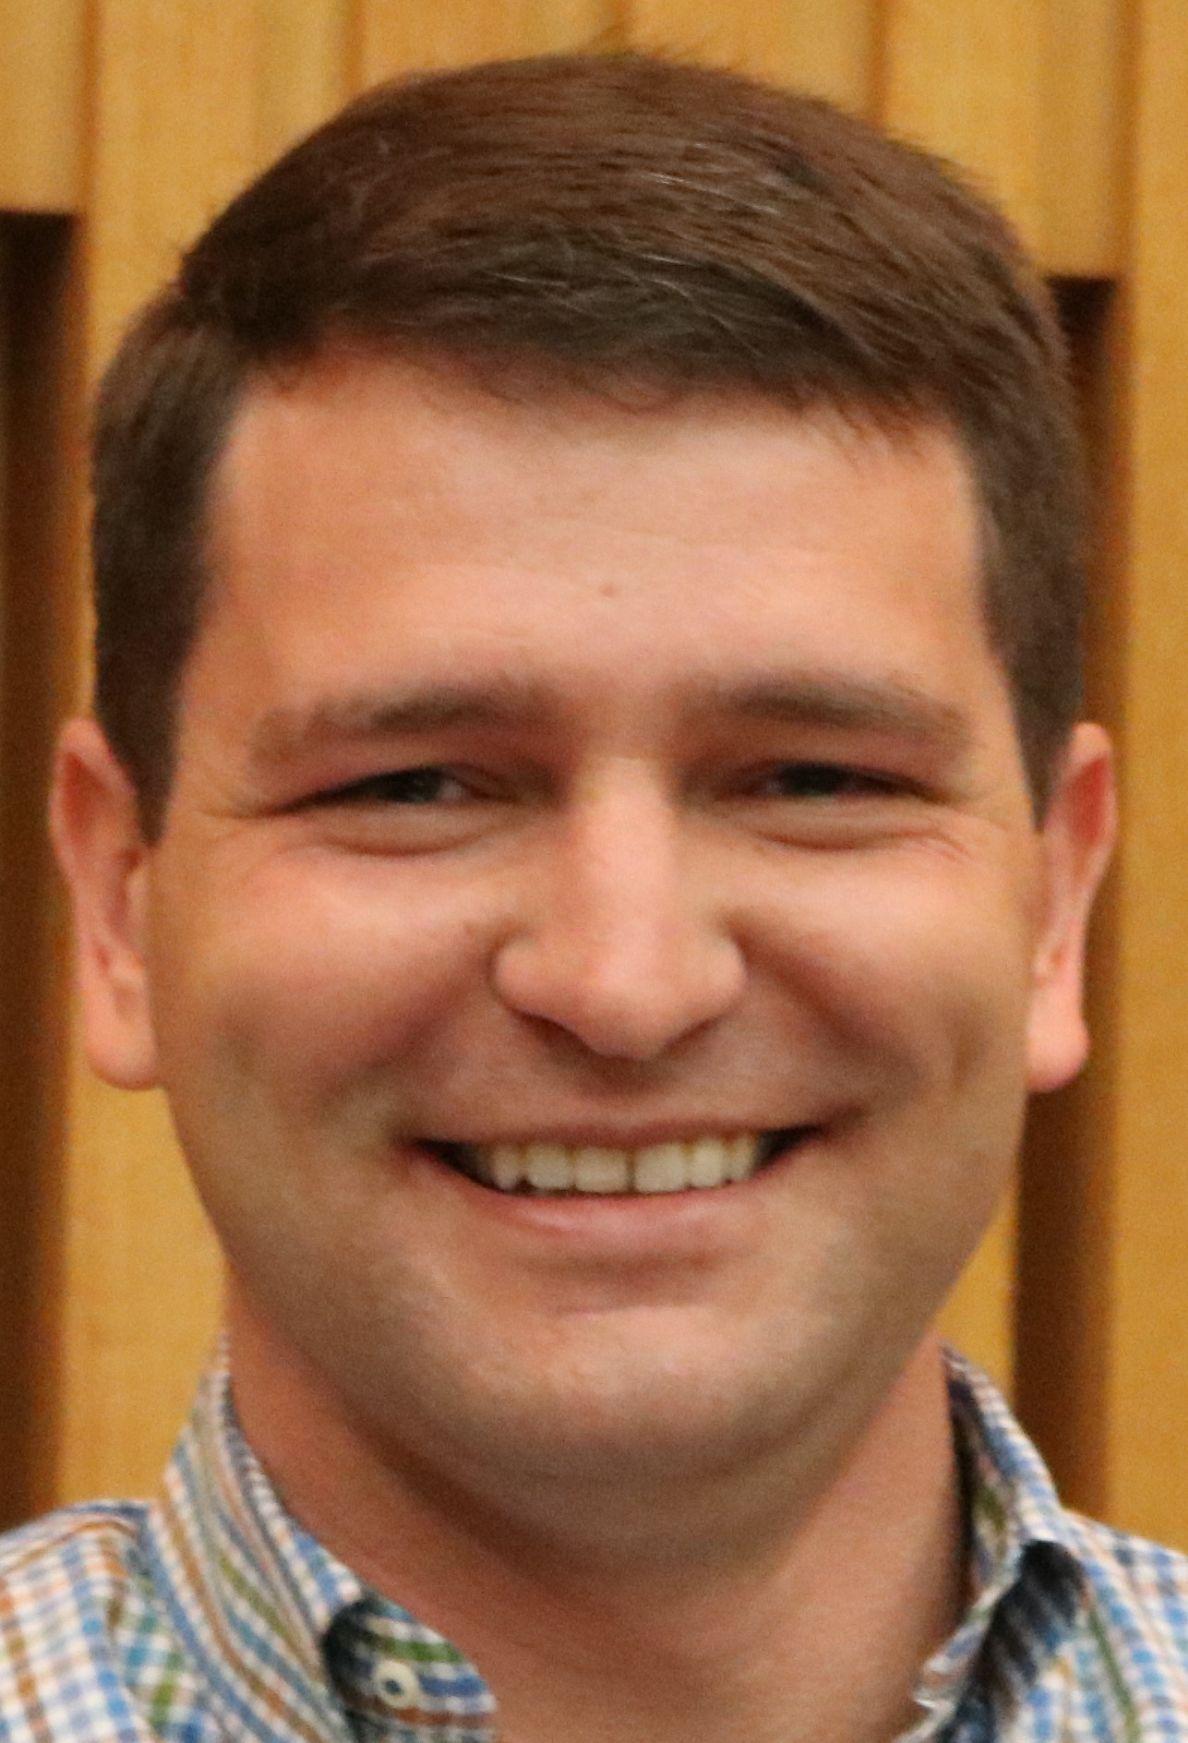 Councilman Jacob Ladner